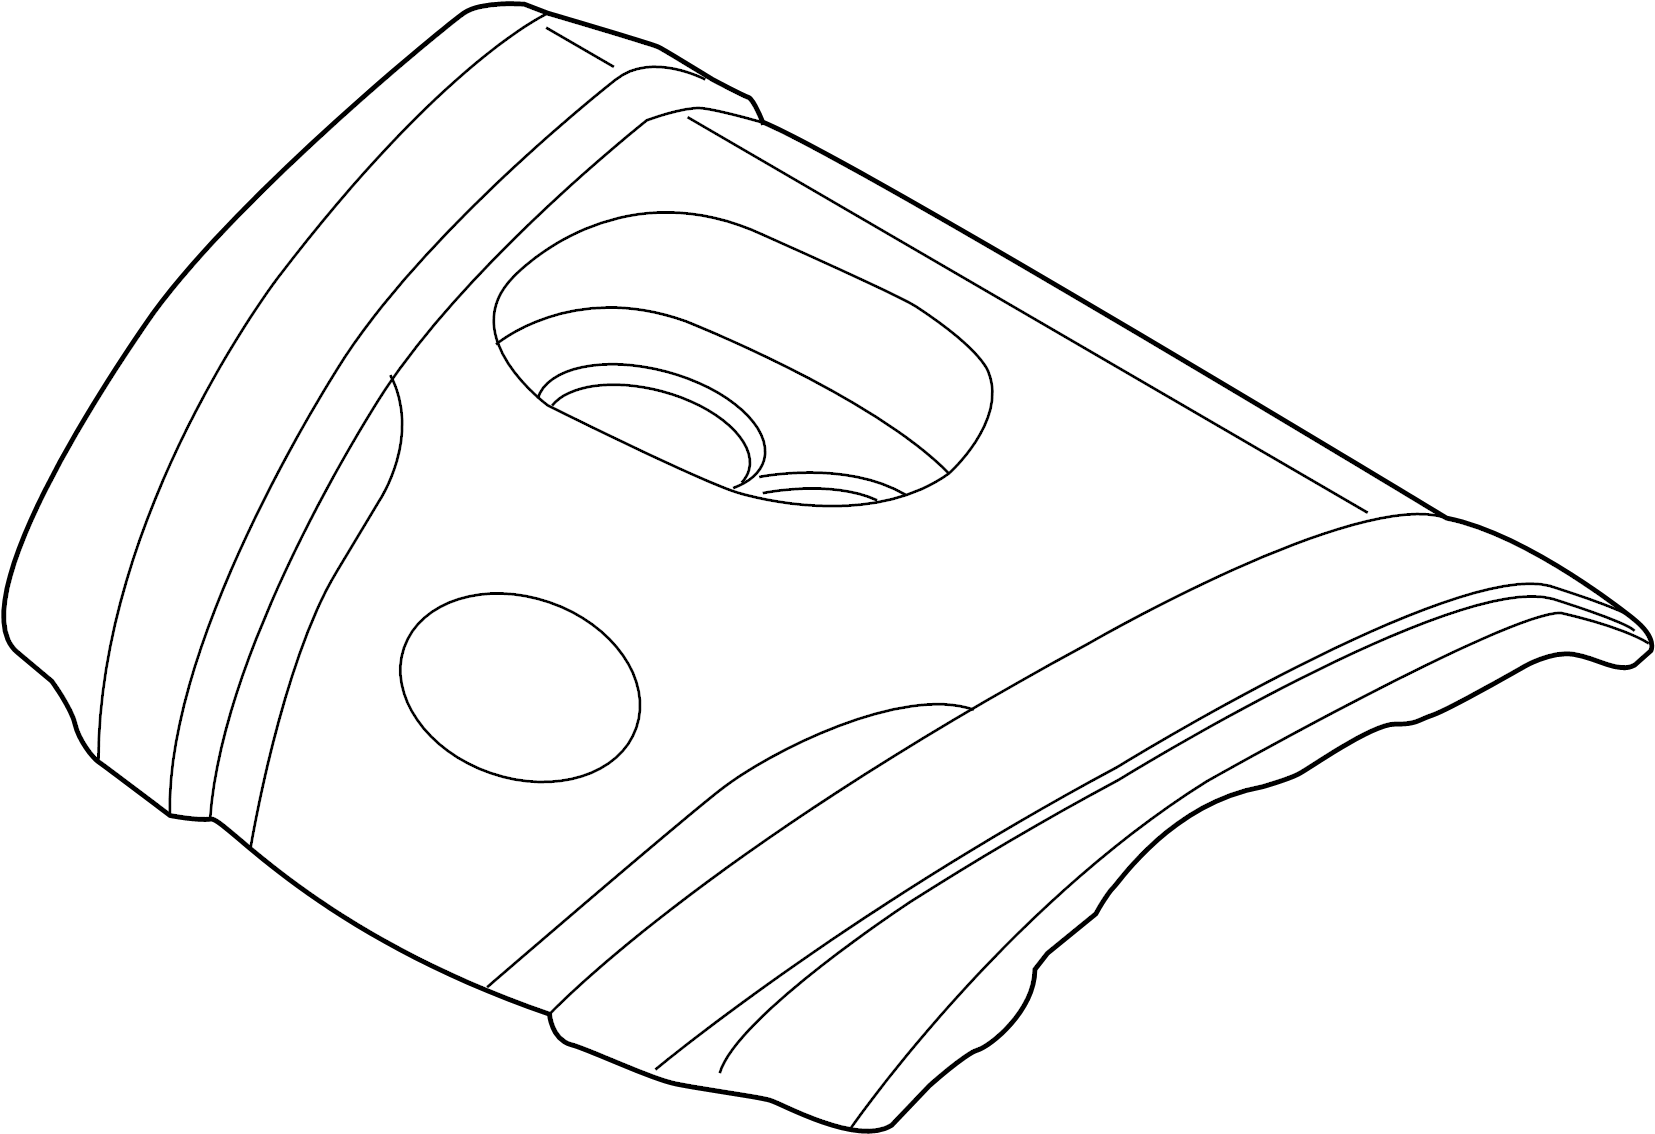 Mazda 6 Cover Valve Engine Head 2 5 Liter 2 5 Liter